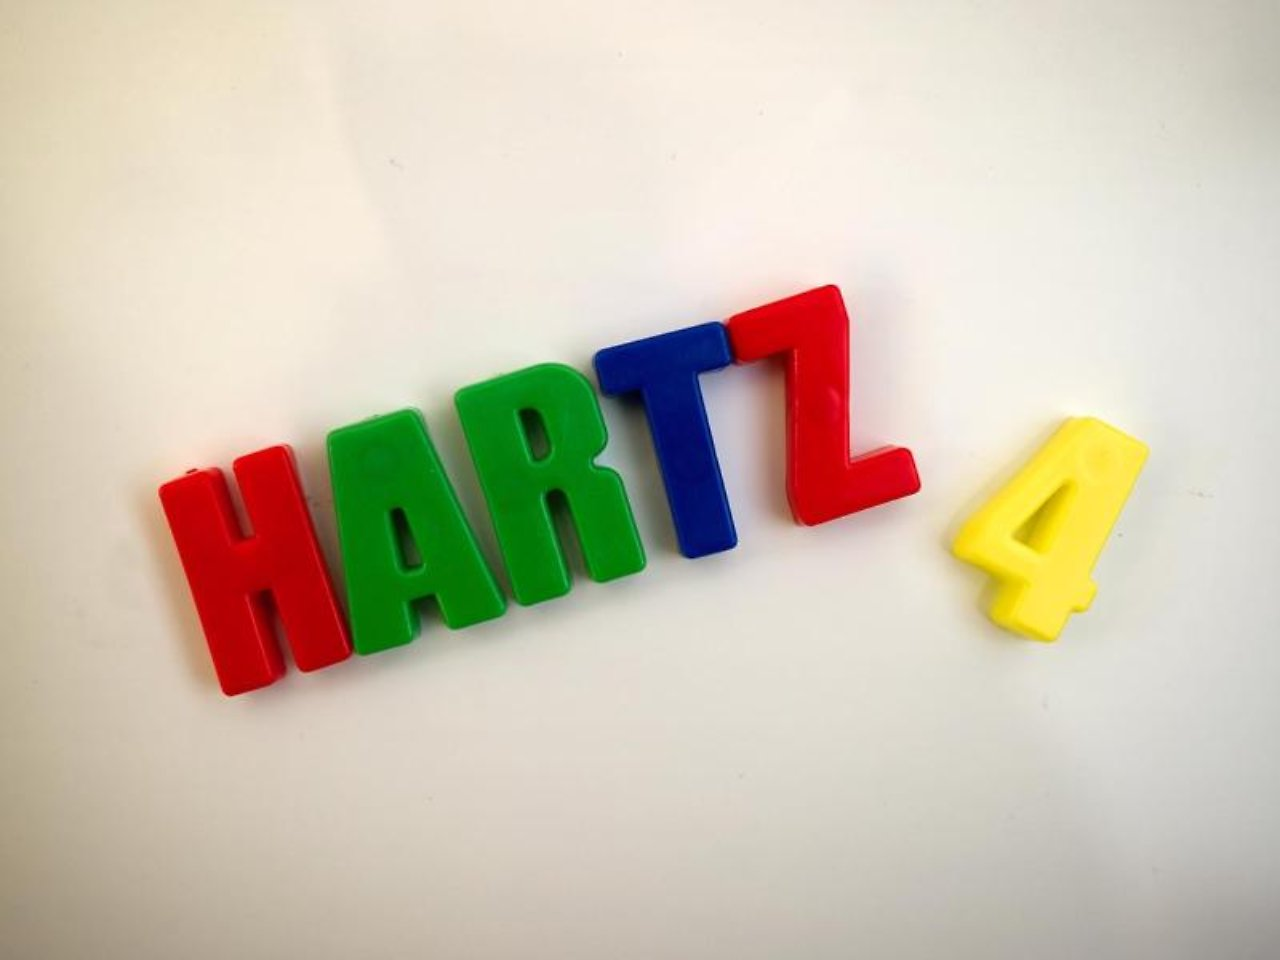 Hartz 4 regelsatz fur single